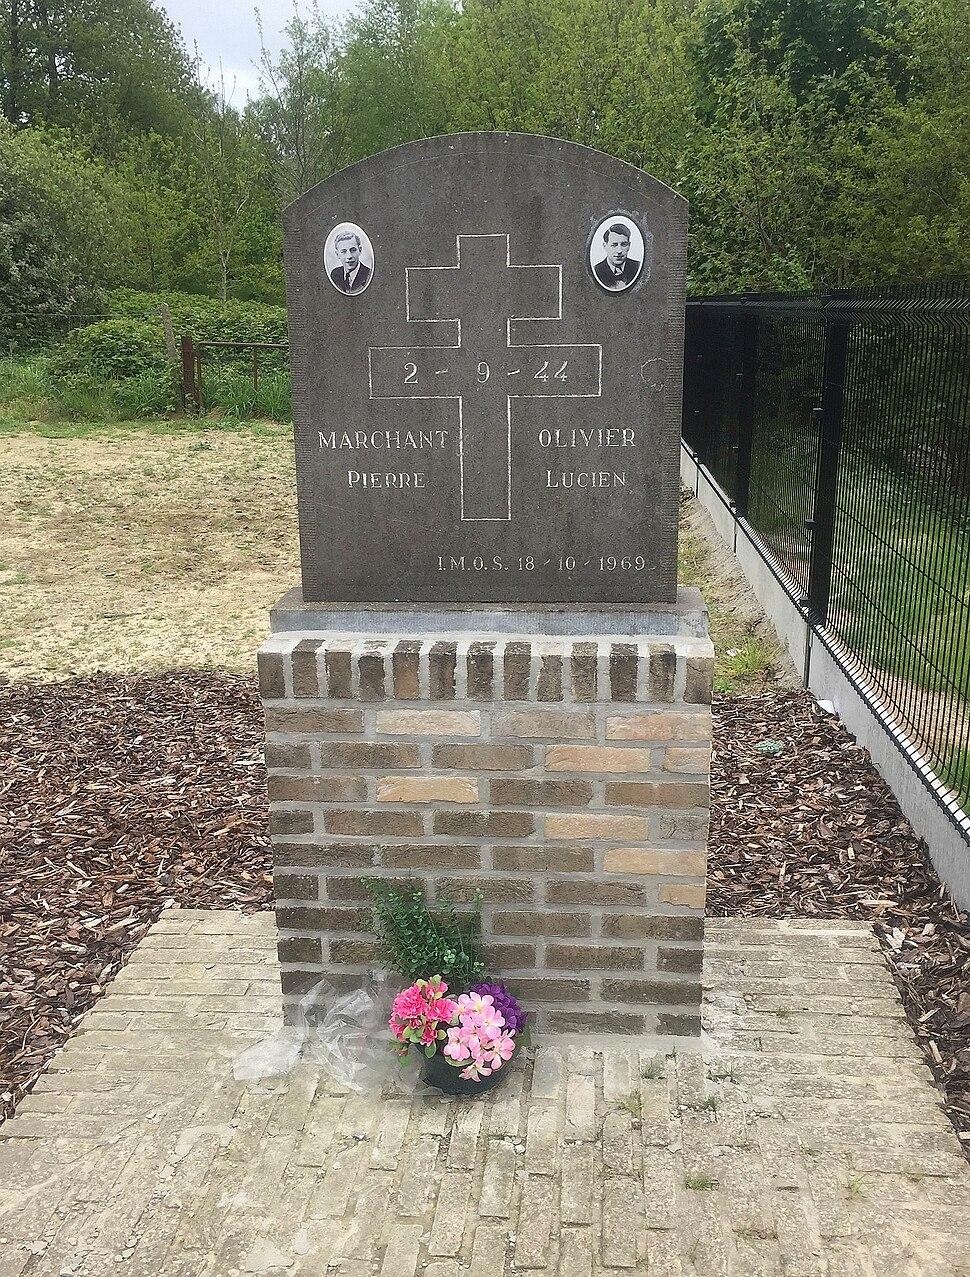 Hill 60 Ypres Belgium Marchant Olivier 1944 Memorial